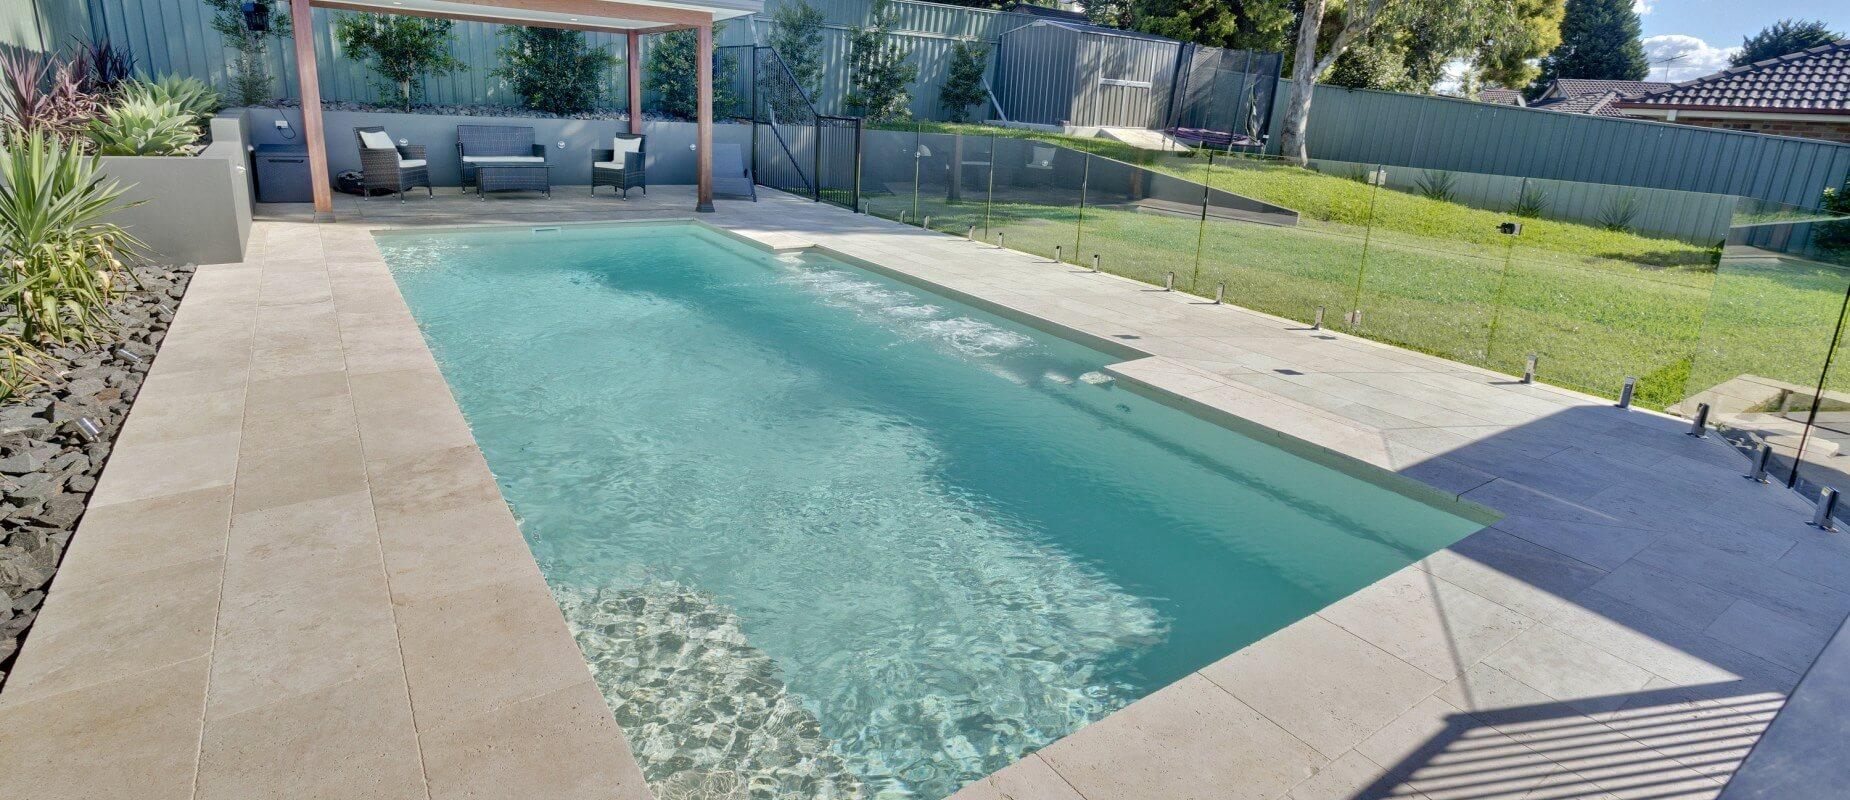 piscina de lux modele frumoase 44